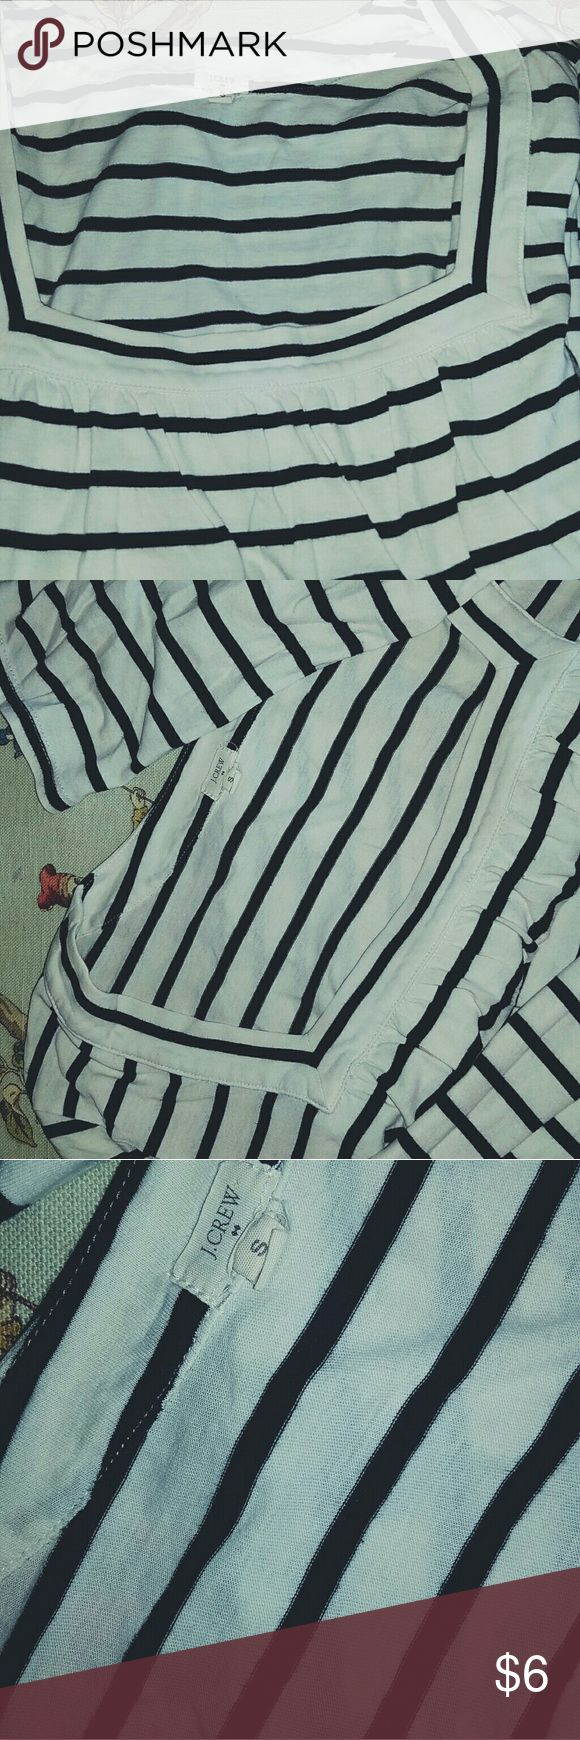 J CREW 1/2 SLEEVE SMALL SHIRT 100% cotton GENTLY OWED j crew Tops Tees - Long Sleeve